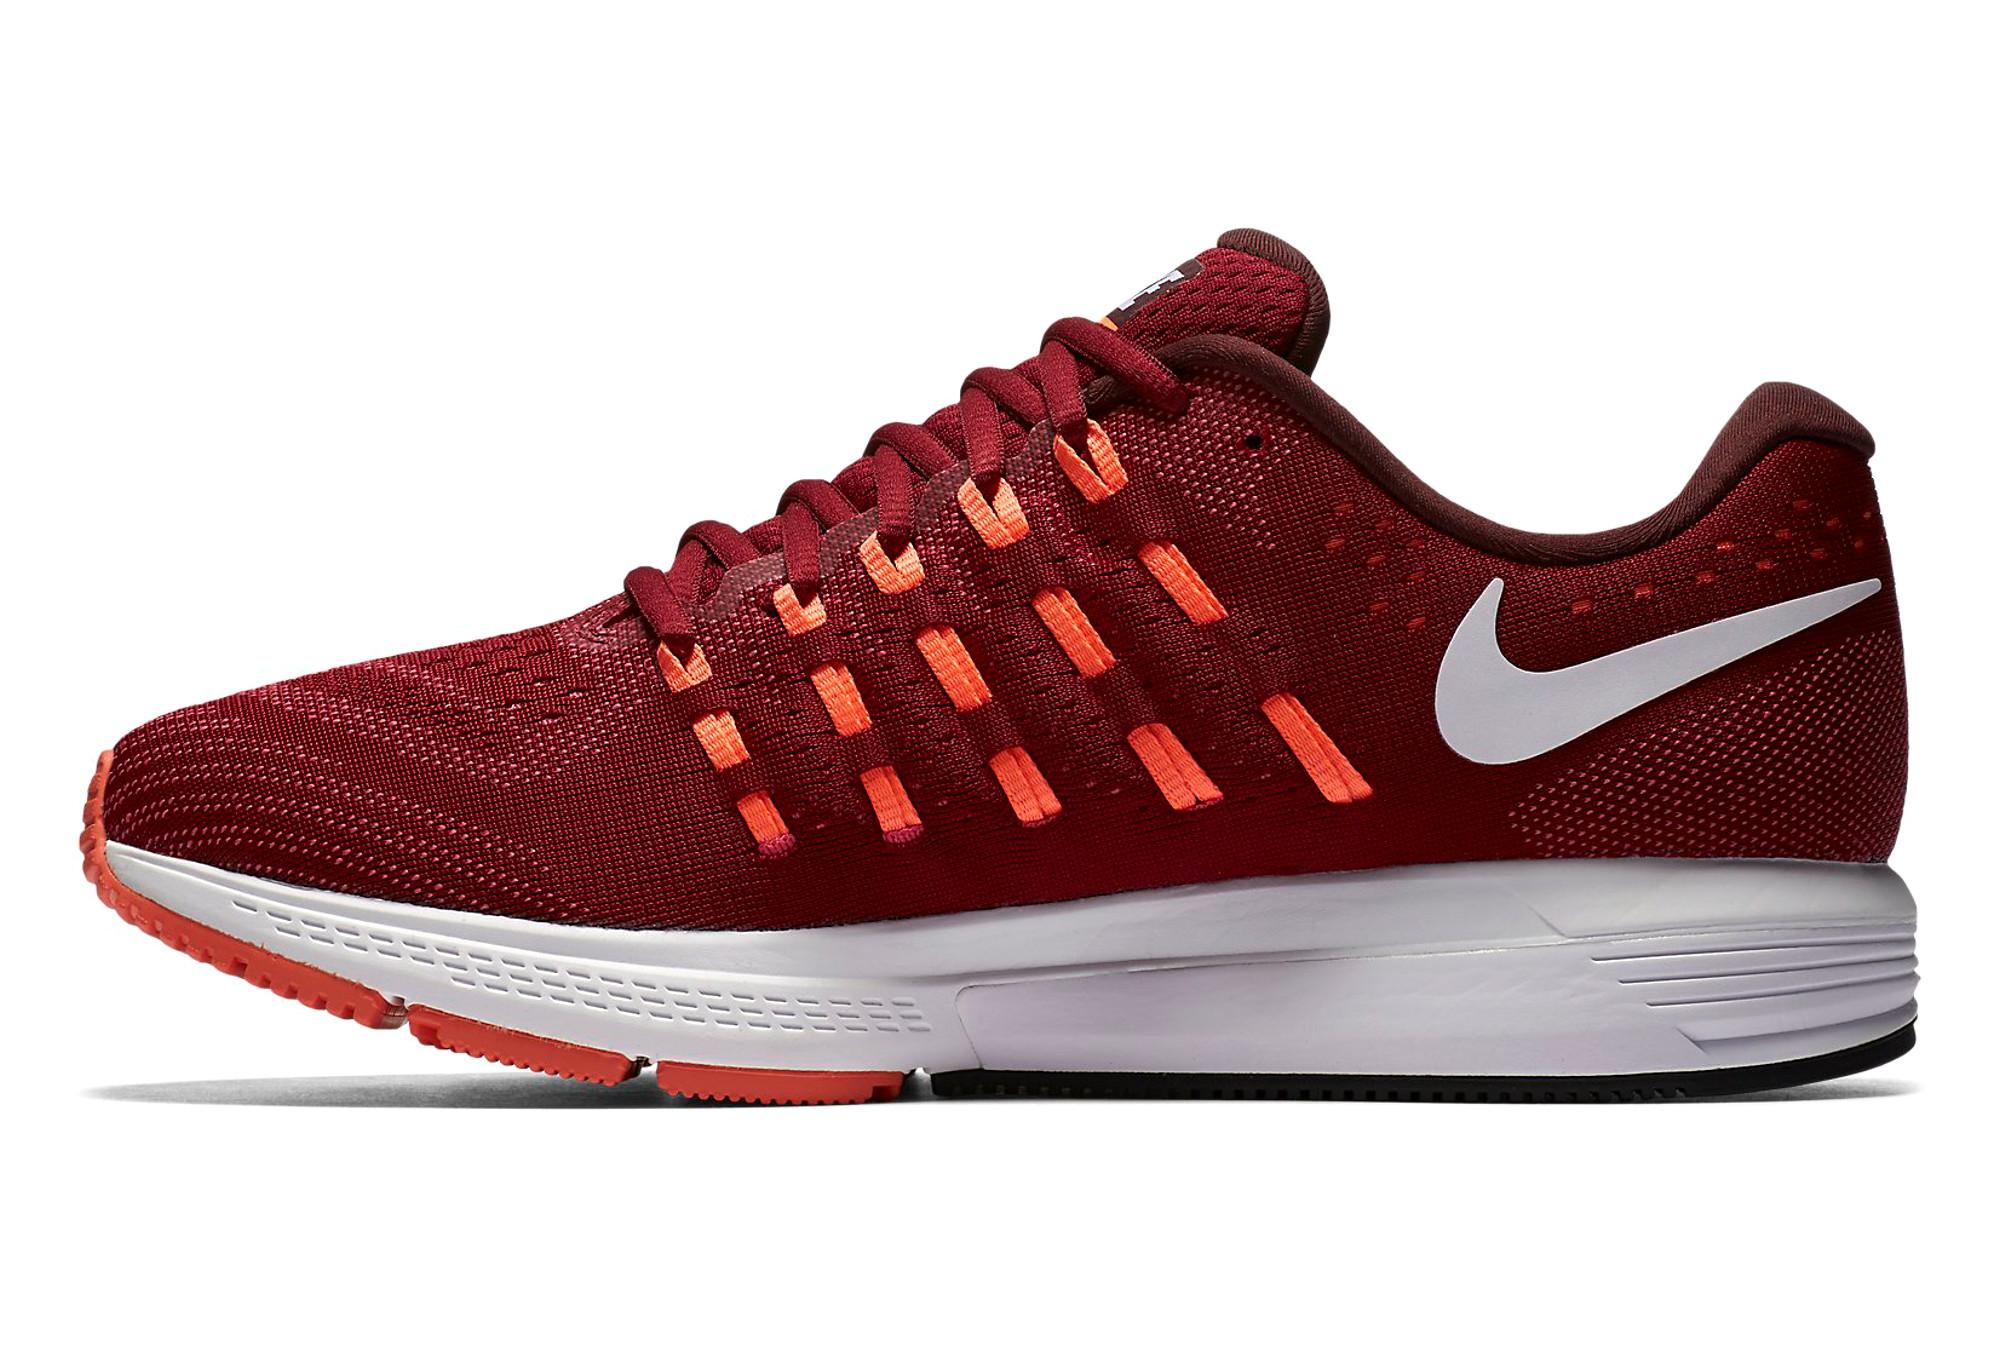 Nike Zoom Air Tamaño De Las Mujeres Vomero 11 O7ZnMqa